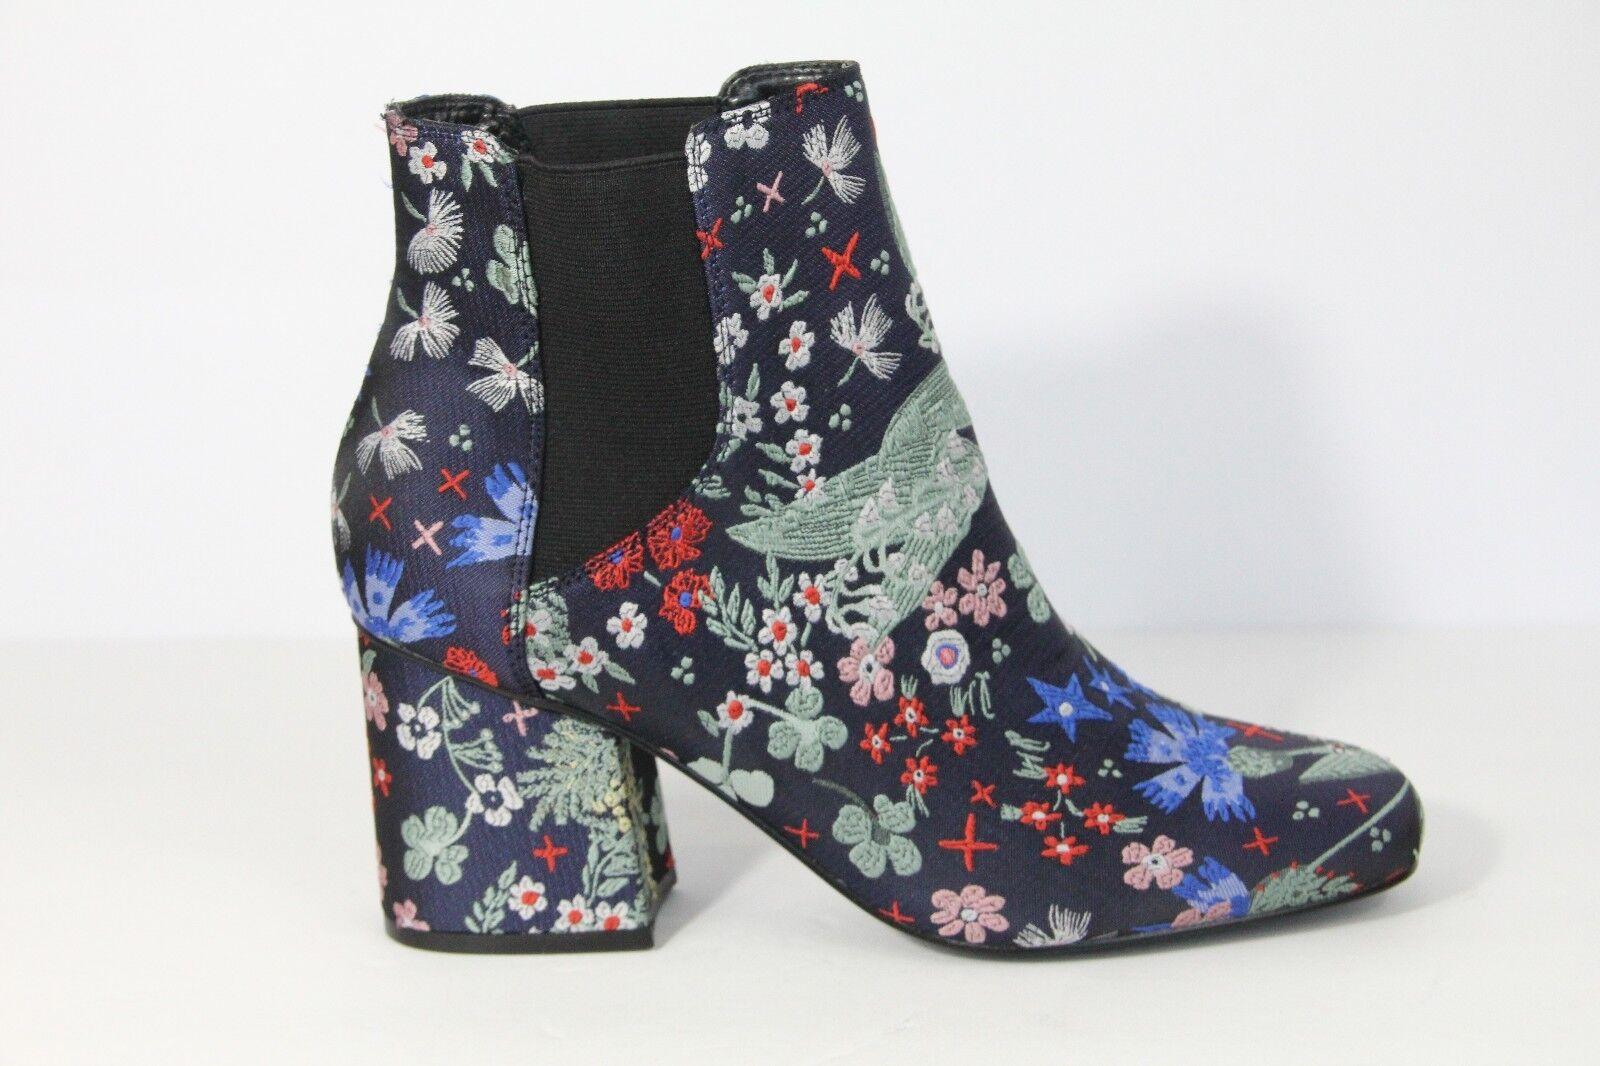 Indigo Rd. Damenschuhe Stiefel Fashion Schuhe Brocade Fabric Floral Chelsea sz 9.5 NEU